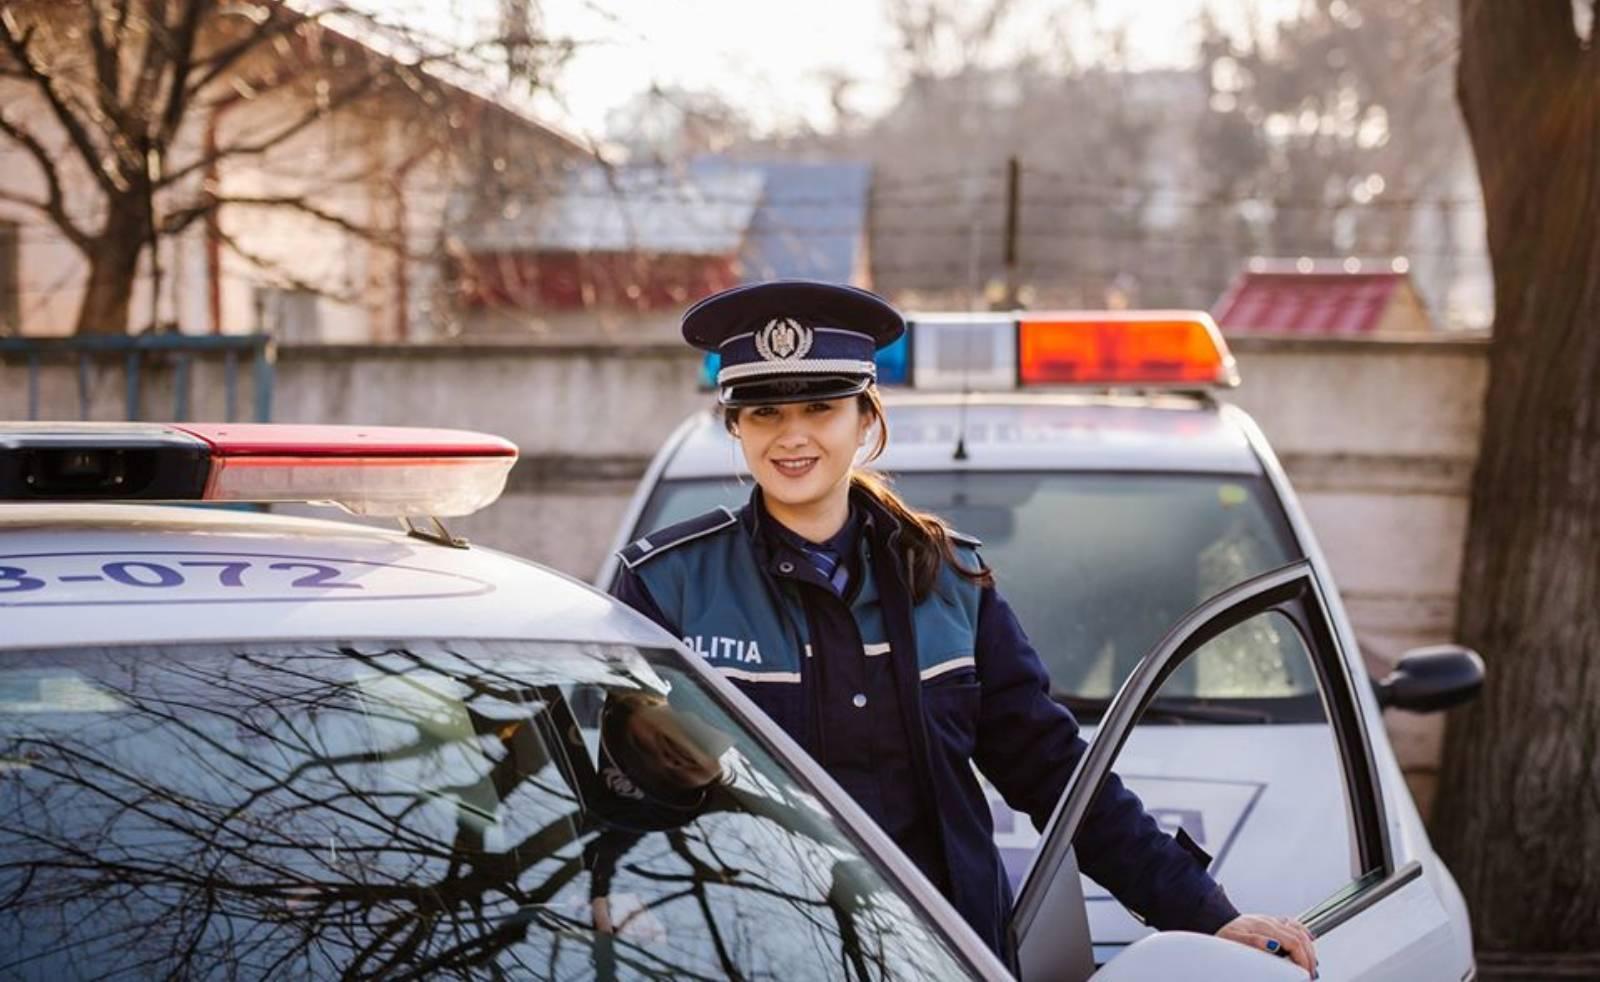 Politia Romana petitie